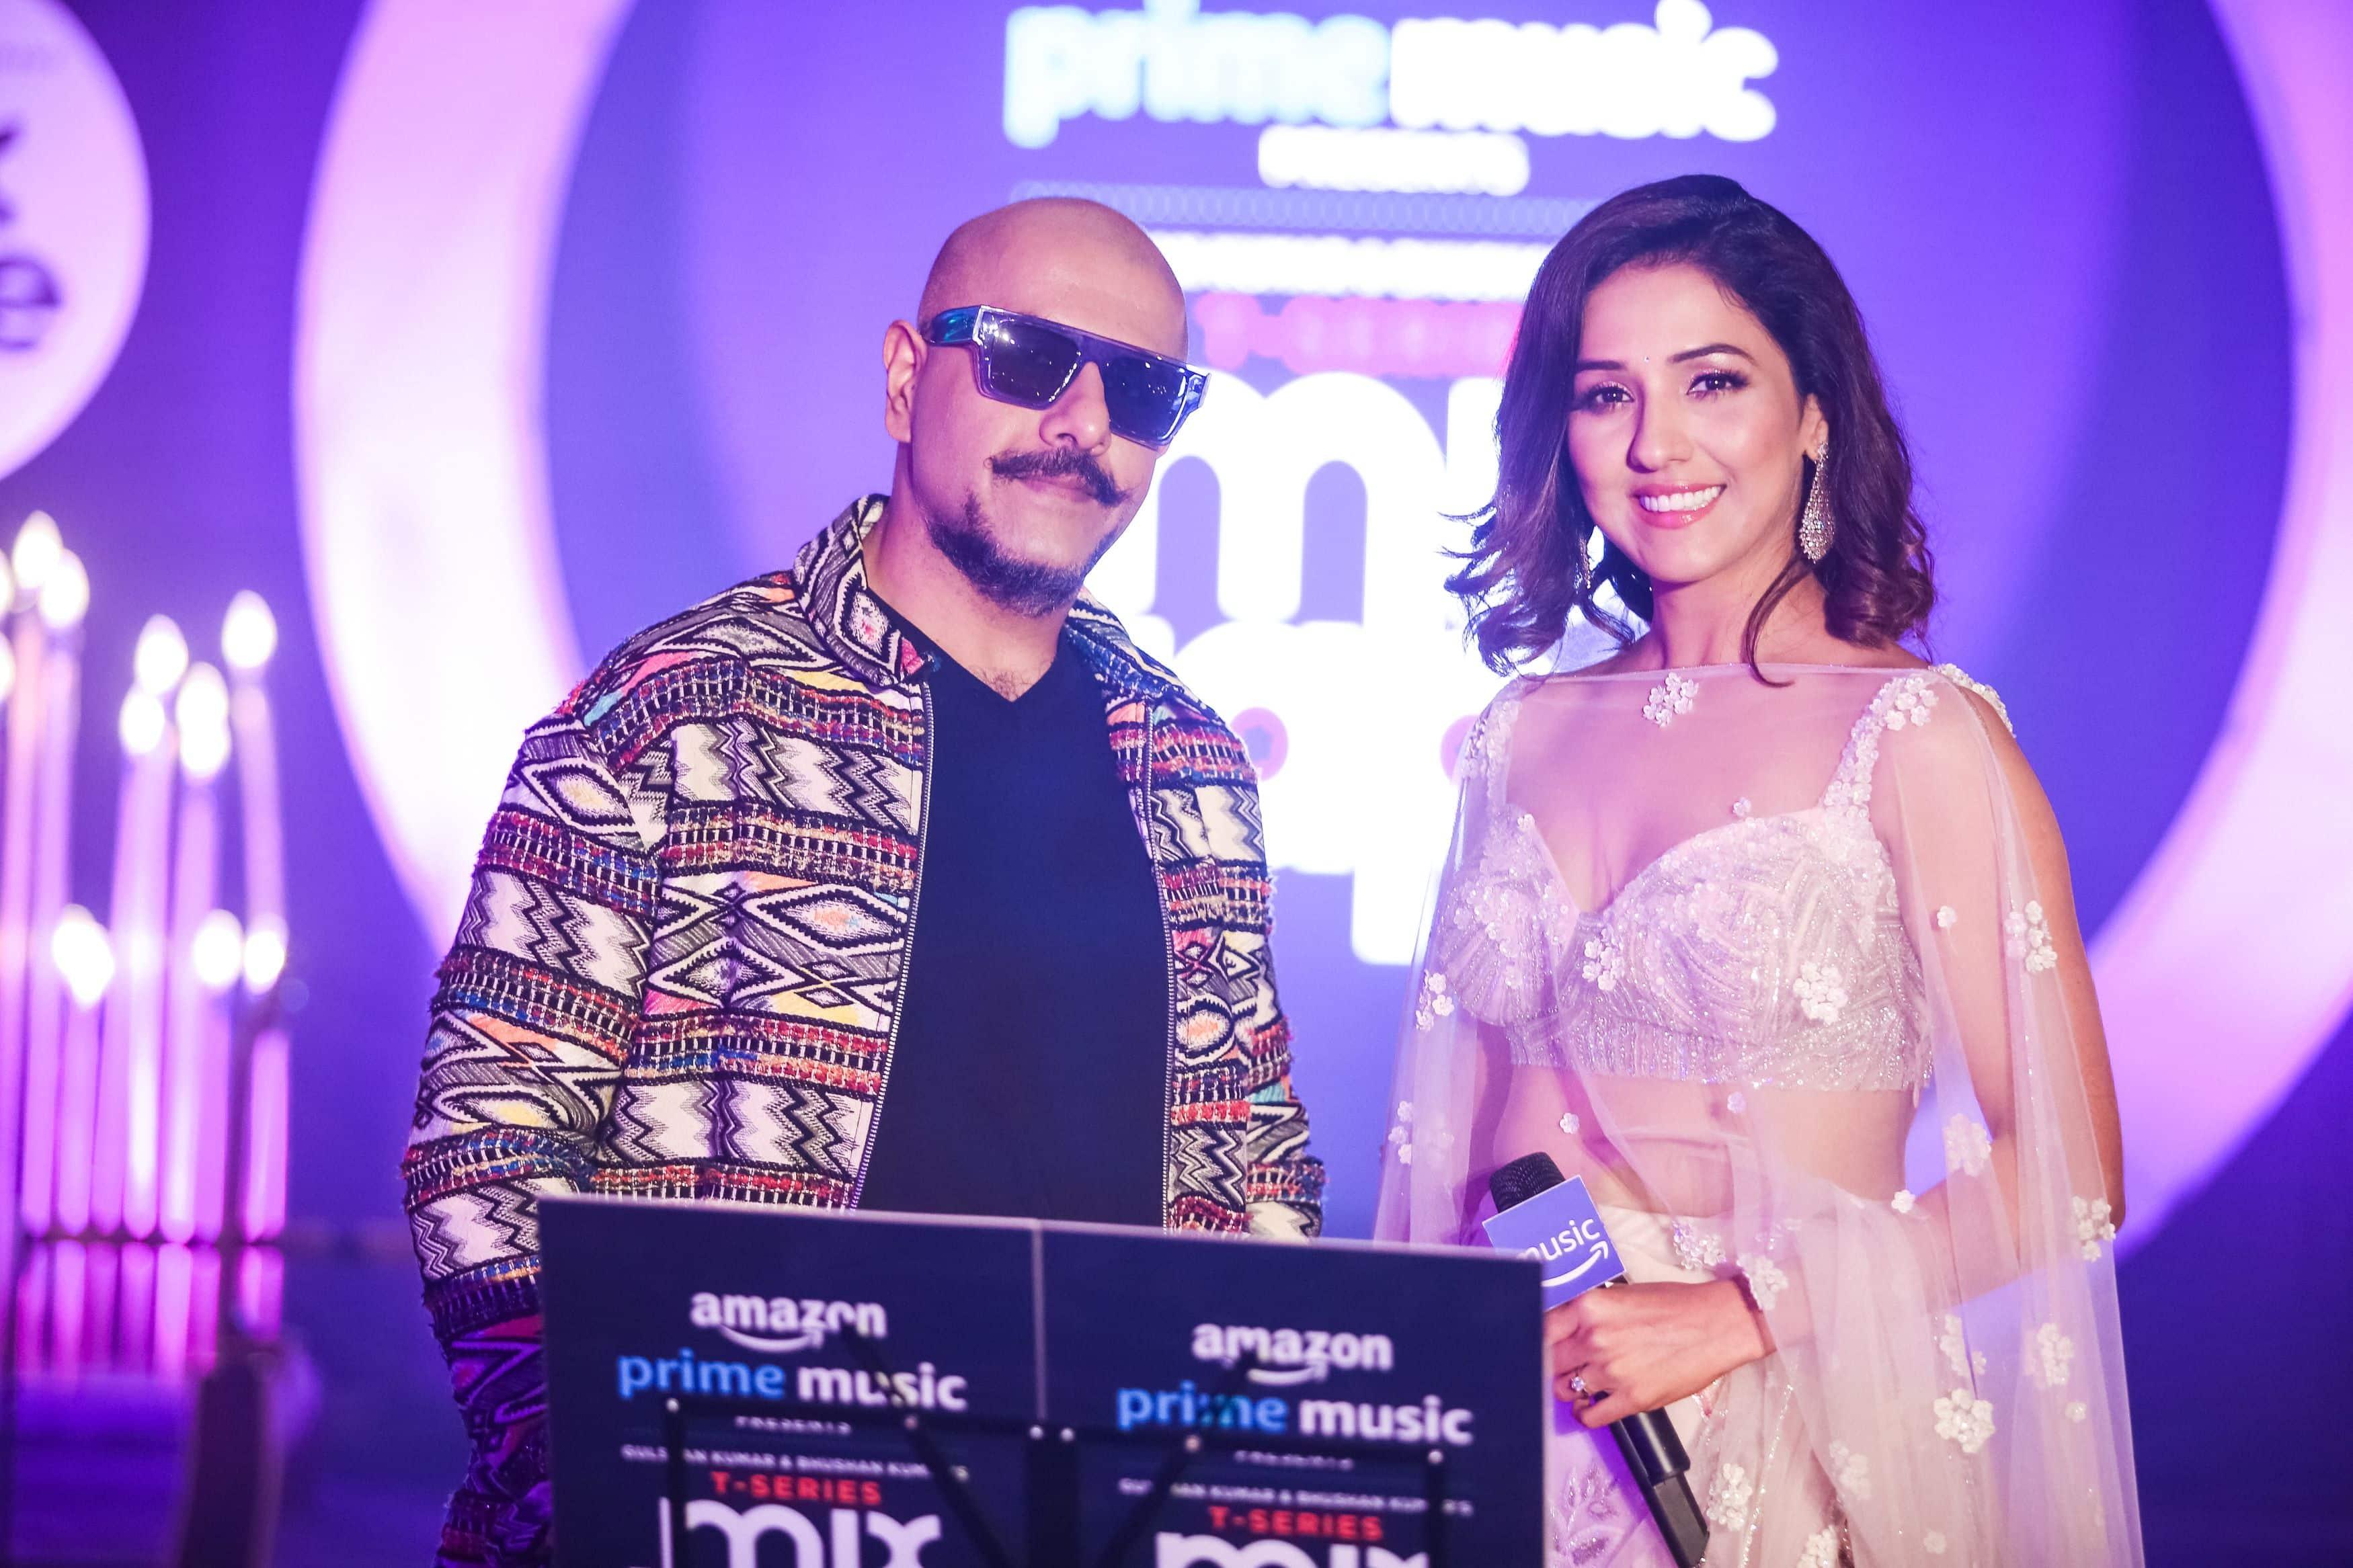 Singer Neeti Mohan And Vishal Dadlani Makes Us Reminisce Over 'Chand Chhupa' And 'Tumhe Apna Banane Ka Junoon' In Third Episode Of T-Series MixTape